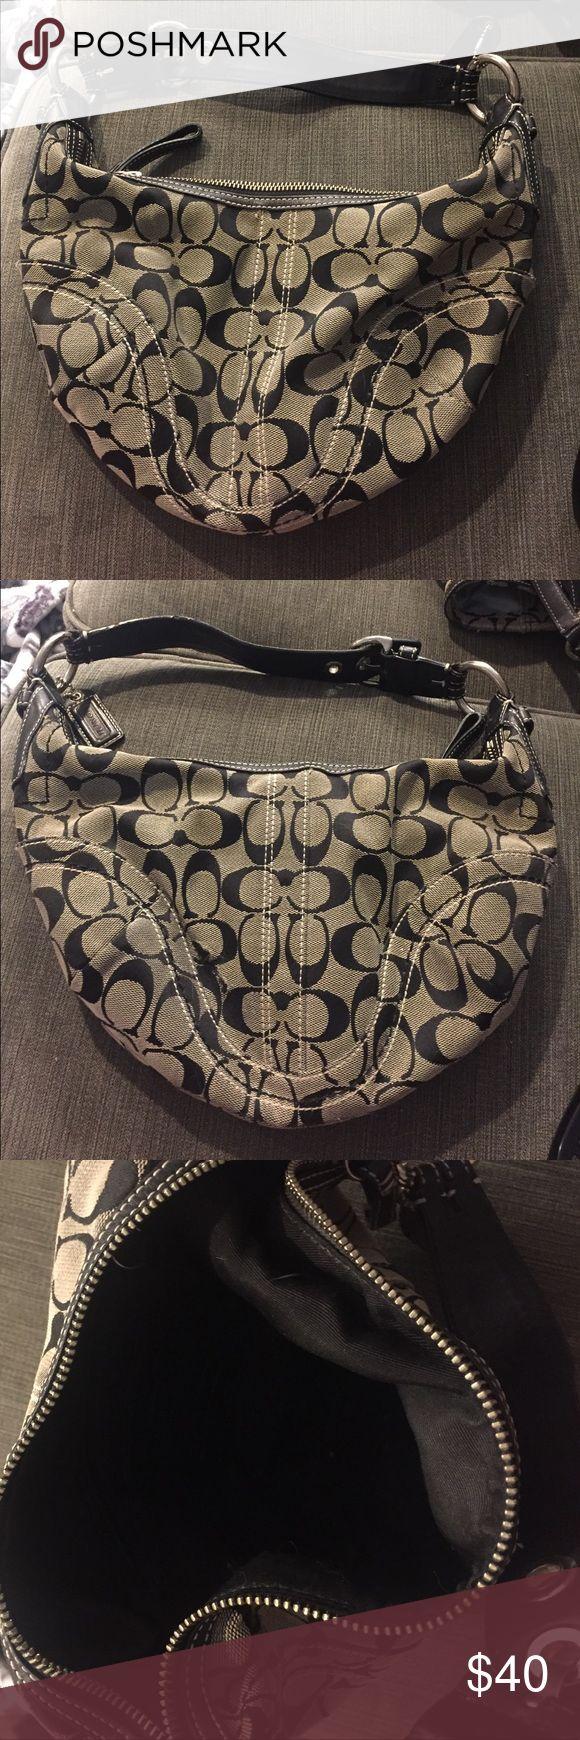 Black coach hobo bag Black and grey small coach hobo bag slightly used good condition Coach Bags Hobos